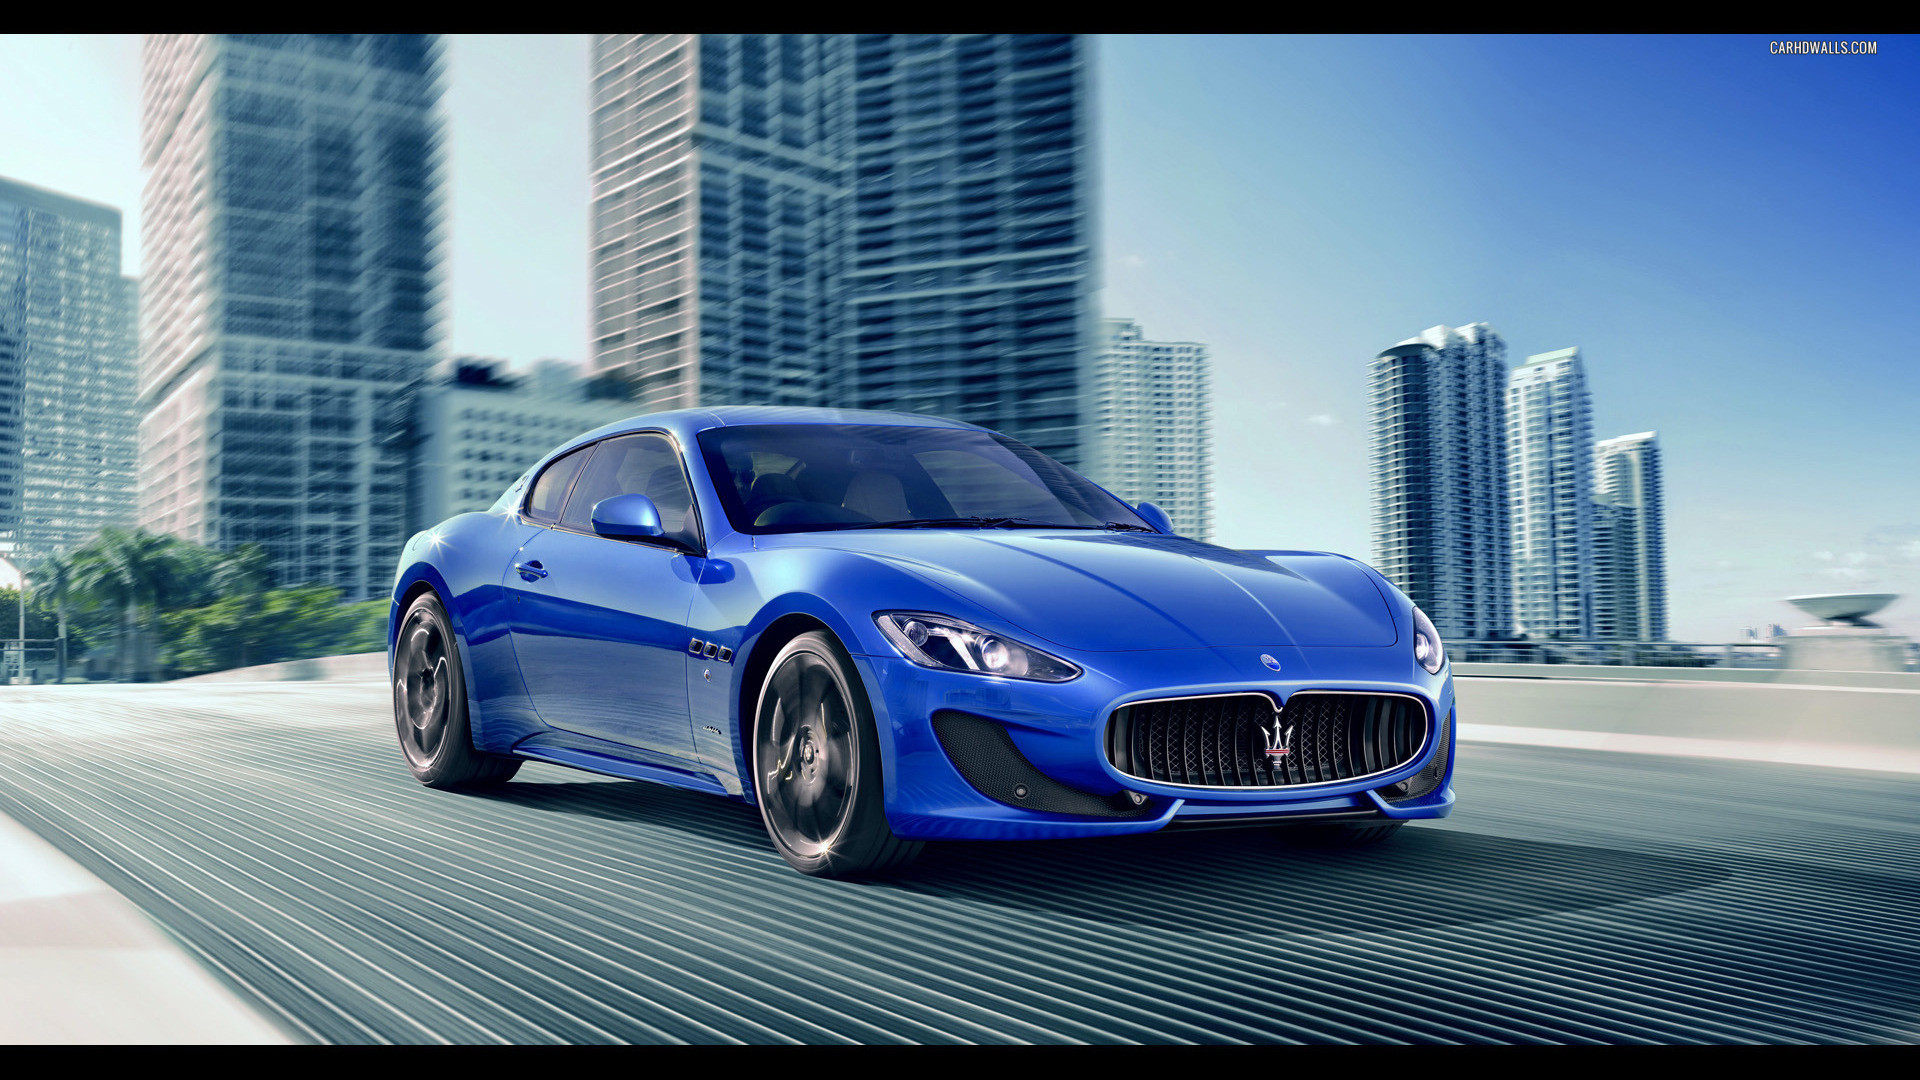 Maserati Car Wallpapers 5 | Maserati Car Wallpapers | Pinterest | Maserati  car, Car wallpapers and Maserati